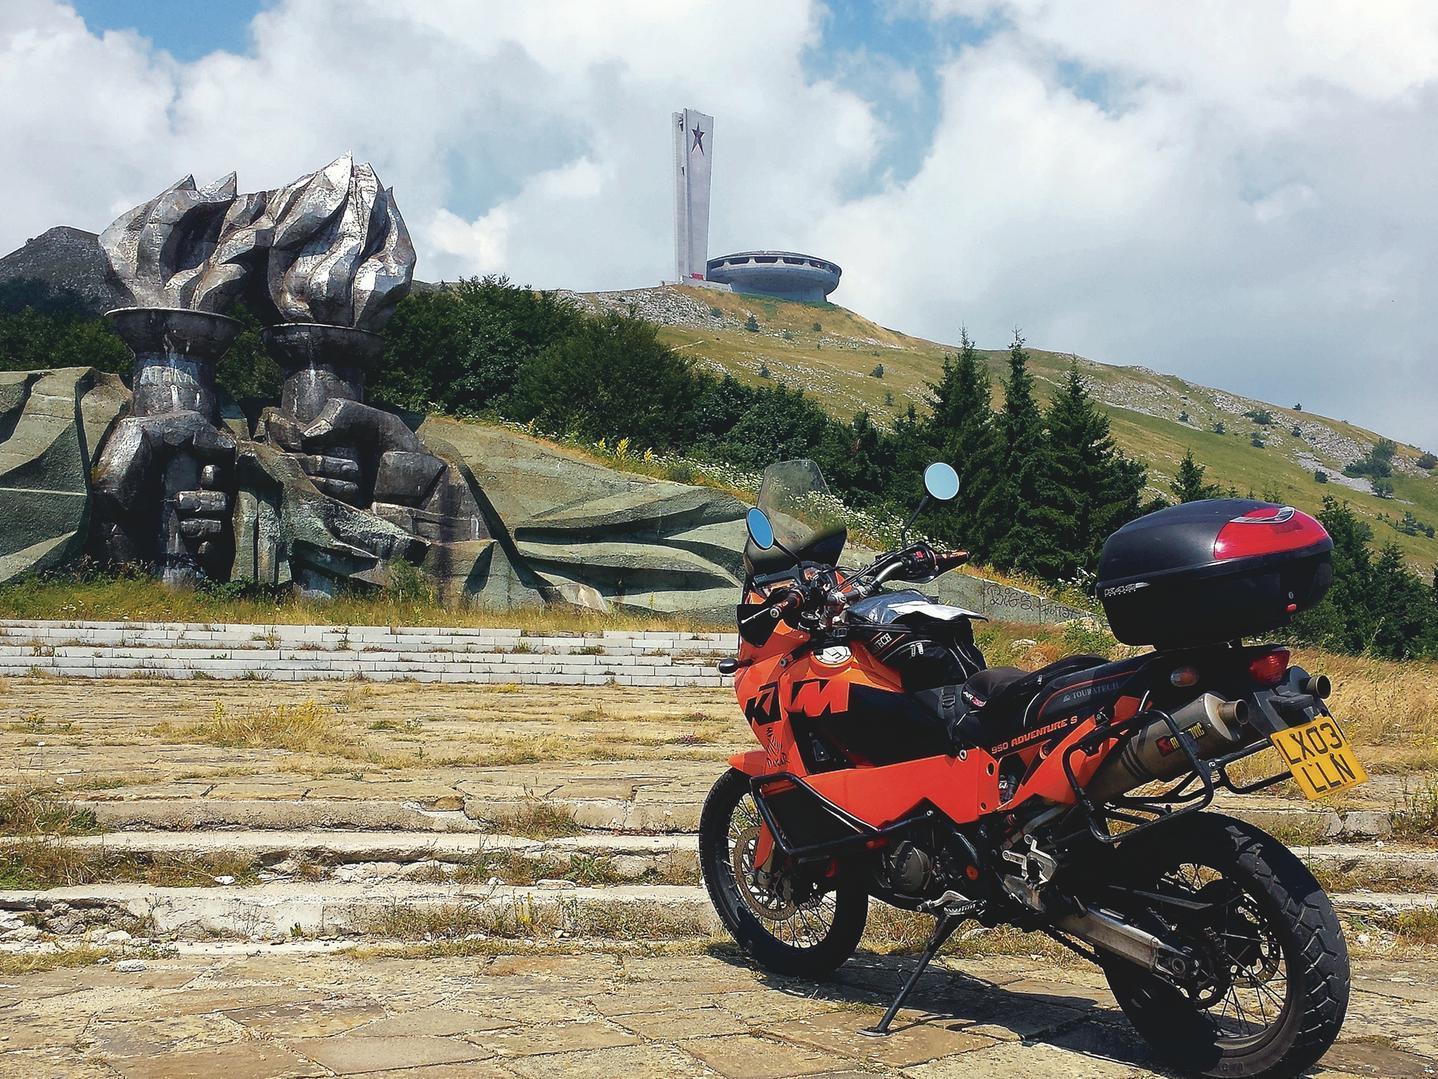 Bulgaria: A motorcycle ride across Europe to Near Varna - Scotland on Sunday Travel Wishlist